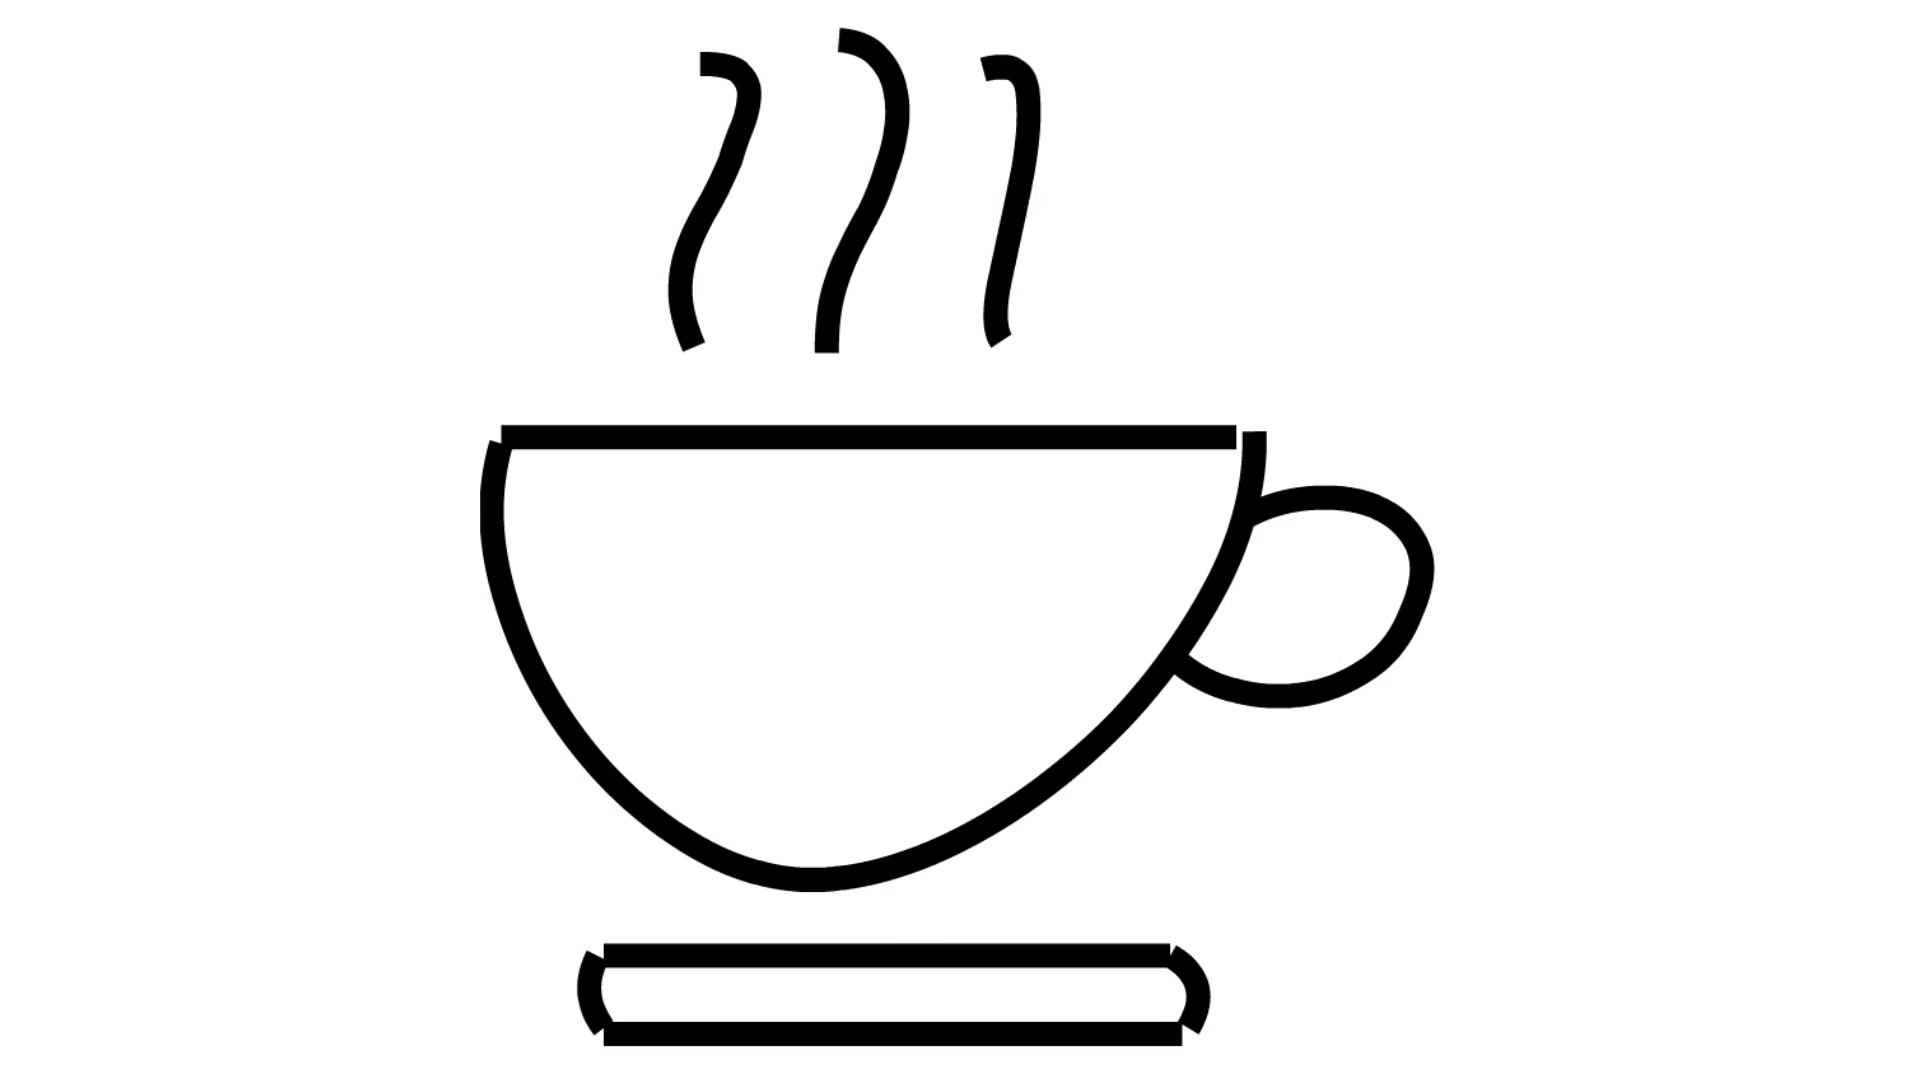 1920x1080 Coffee Tea Cup With Smoke Line Drawing Illustration Animation